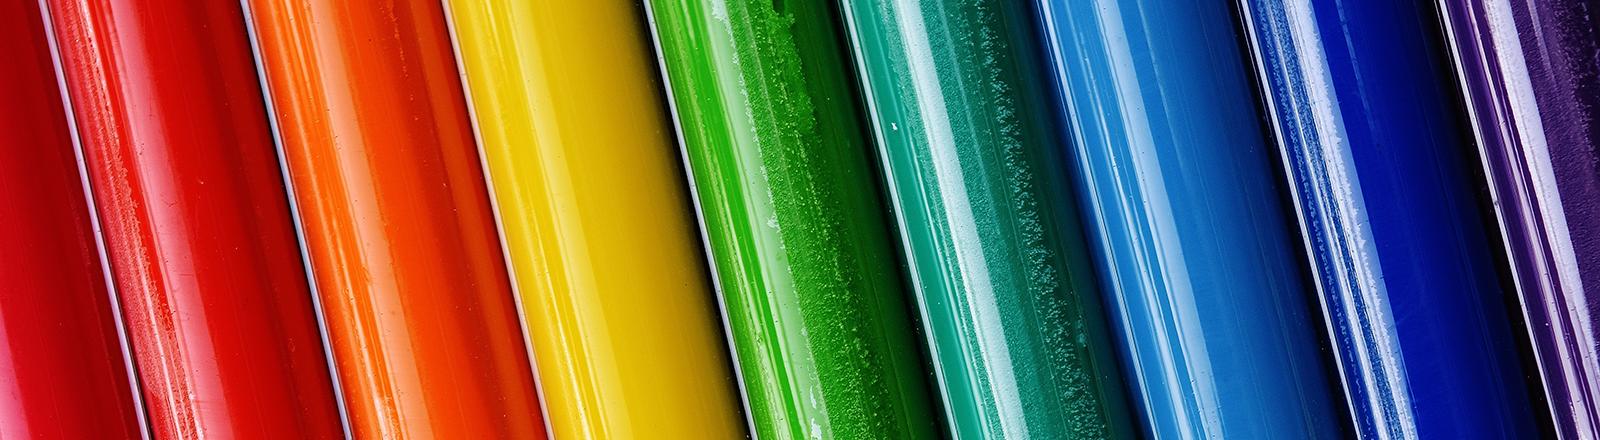 Plastikstrohhalme in Regenbogenfarben